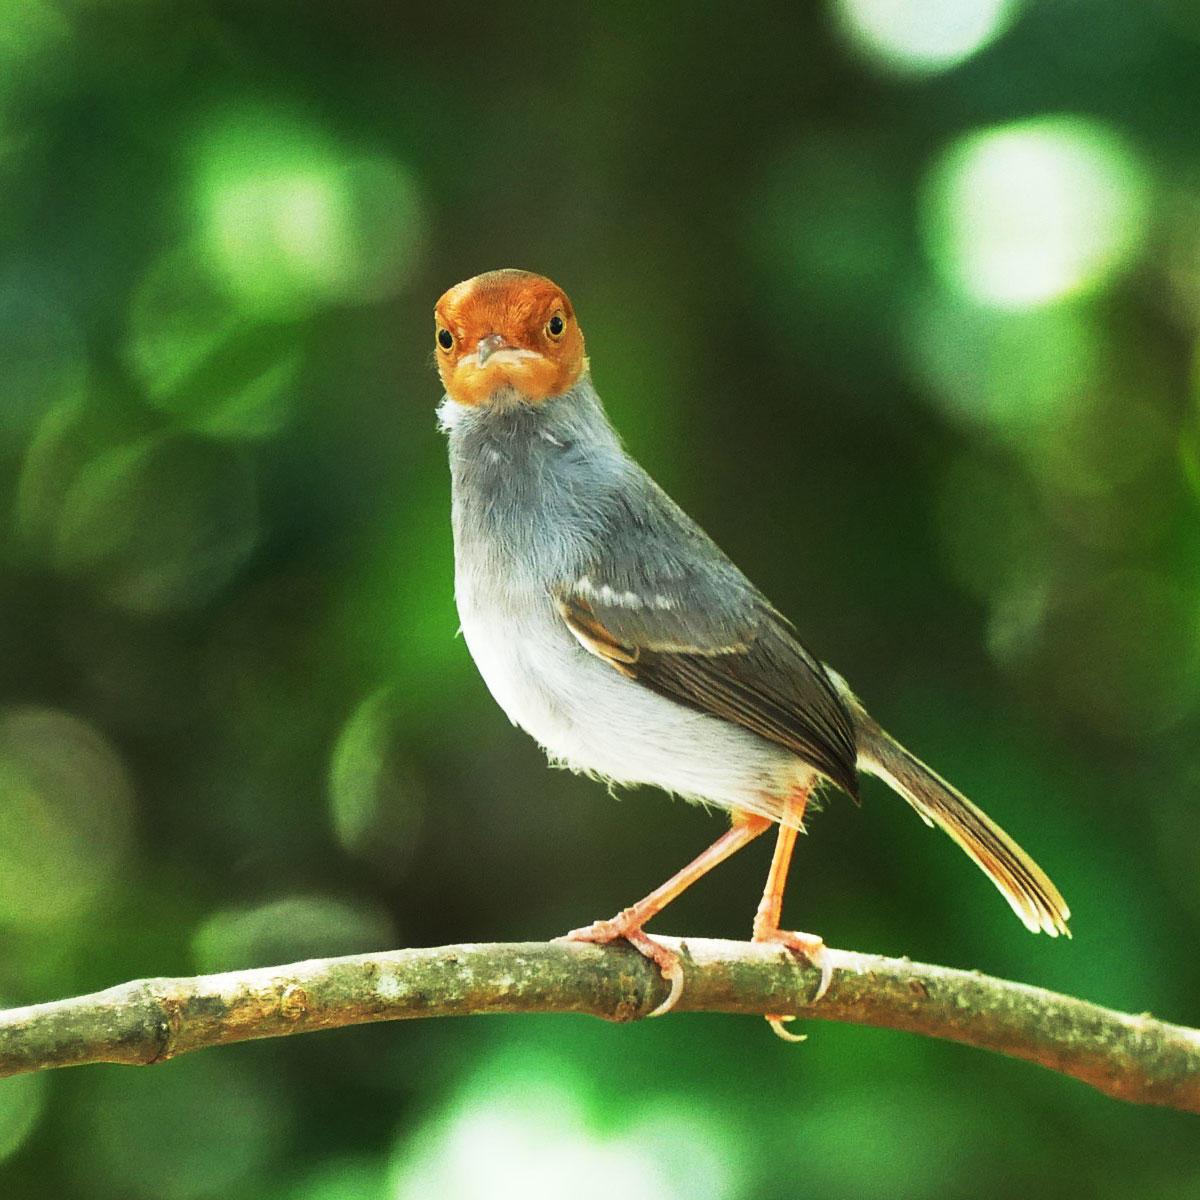 Ashy Tailorbirds are a common mangrove resident in Malaysia. Noah Strycker